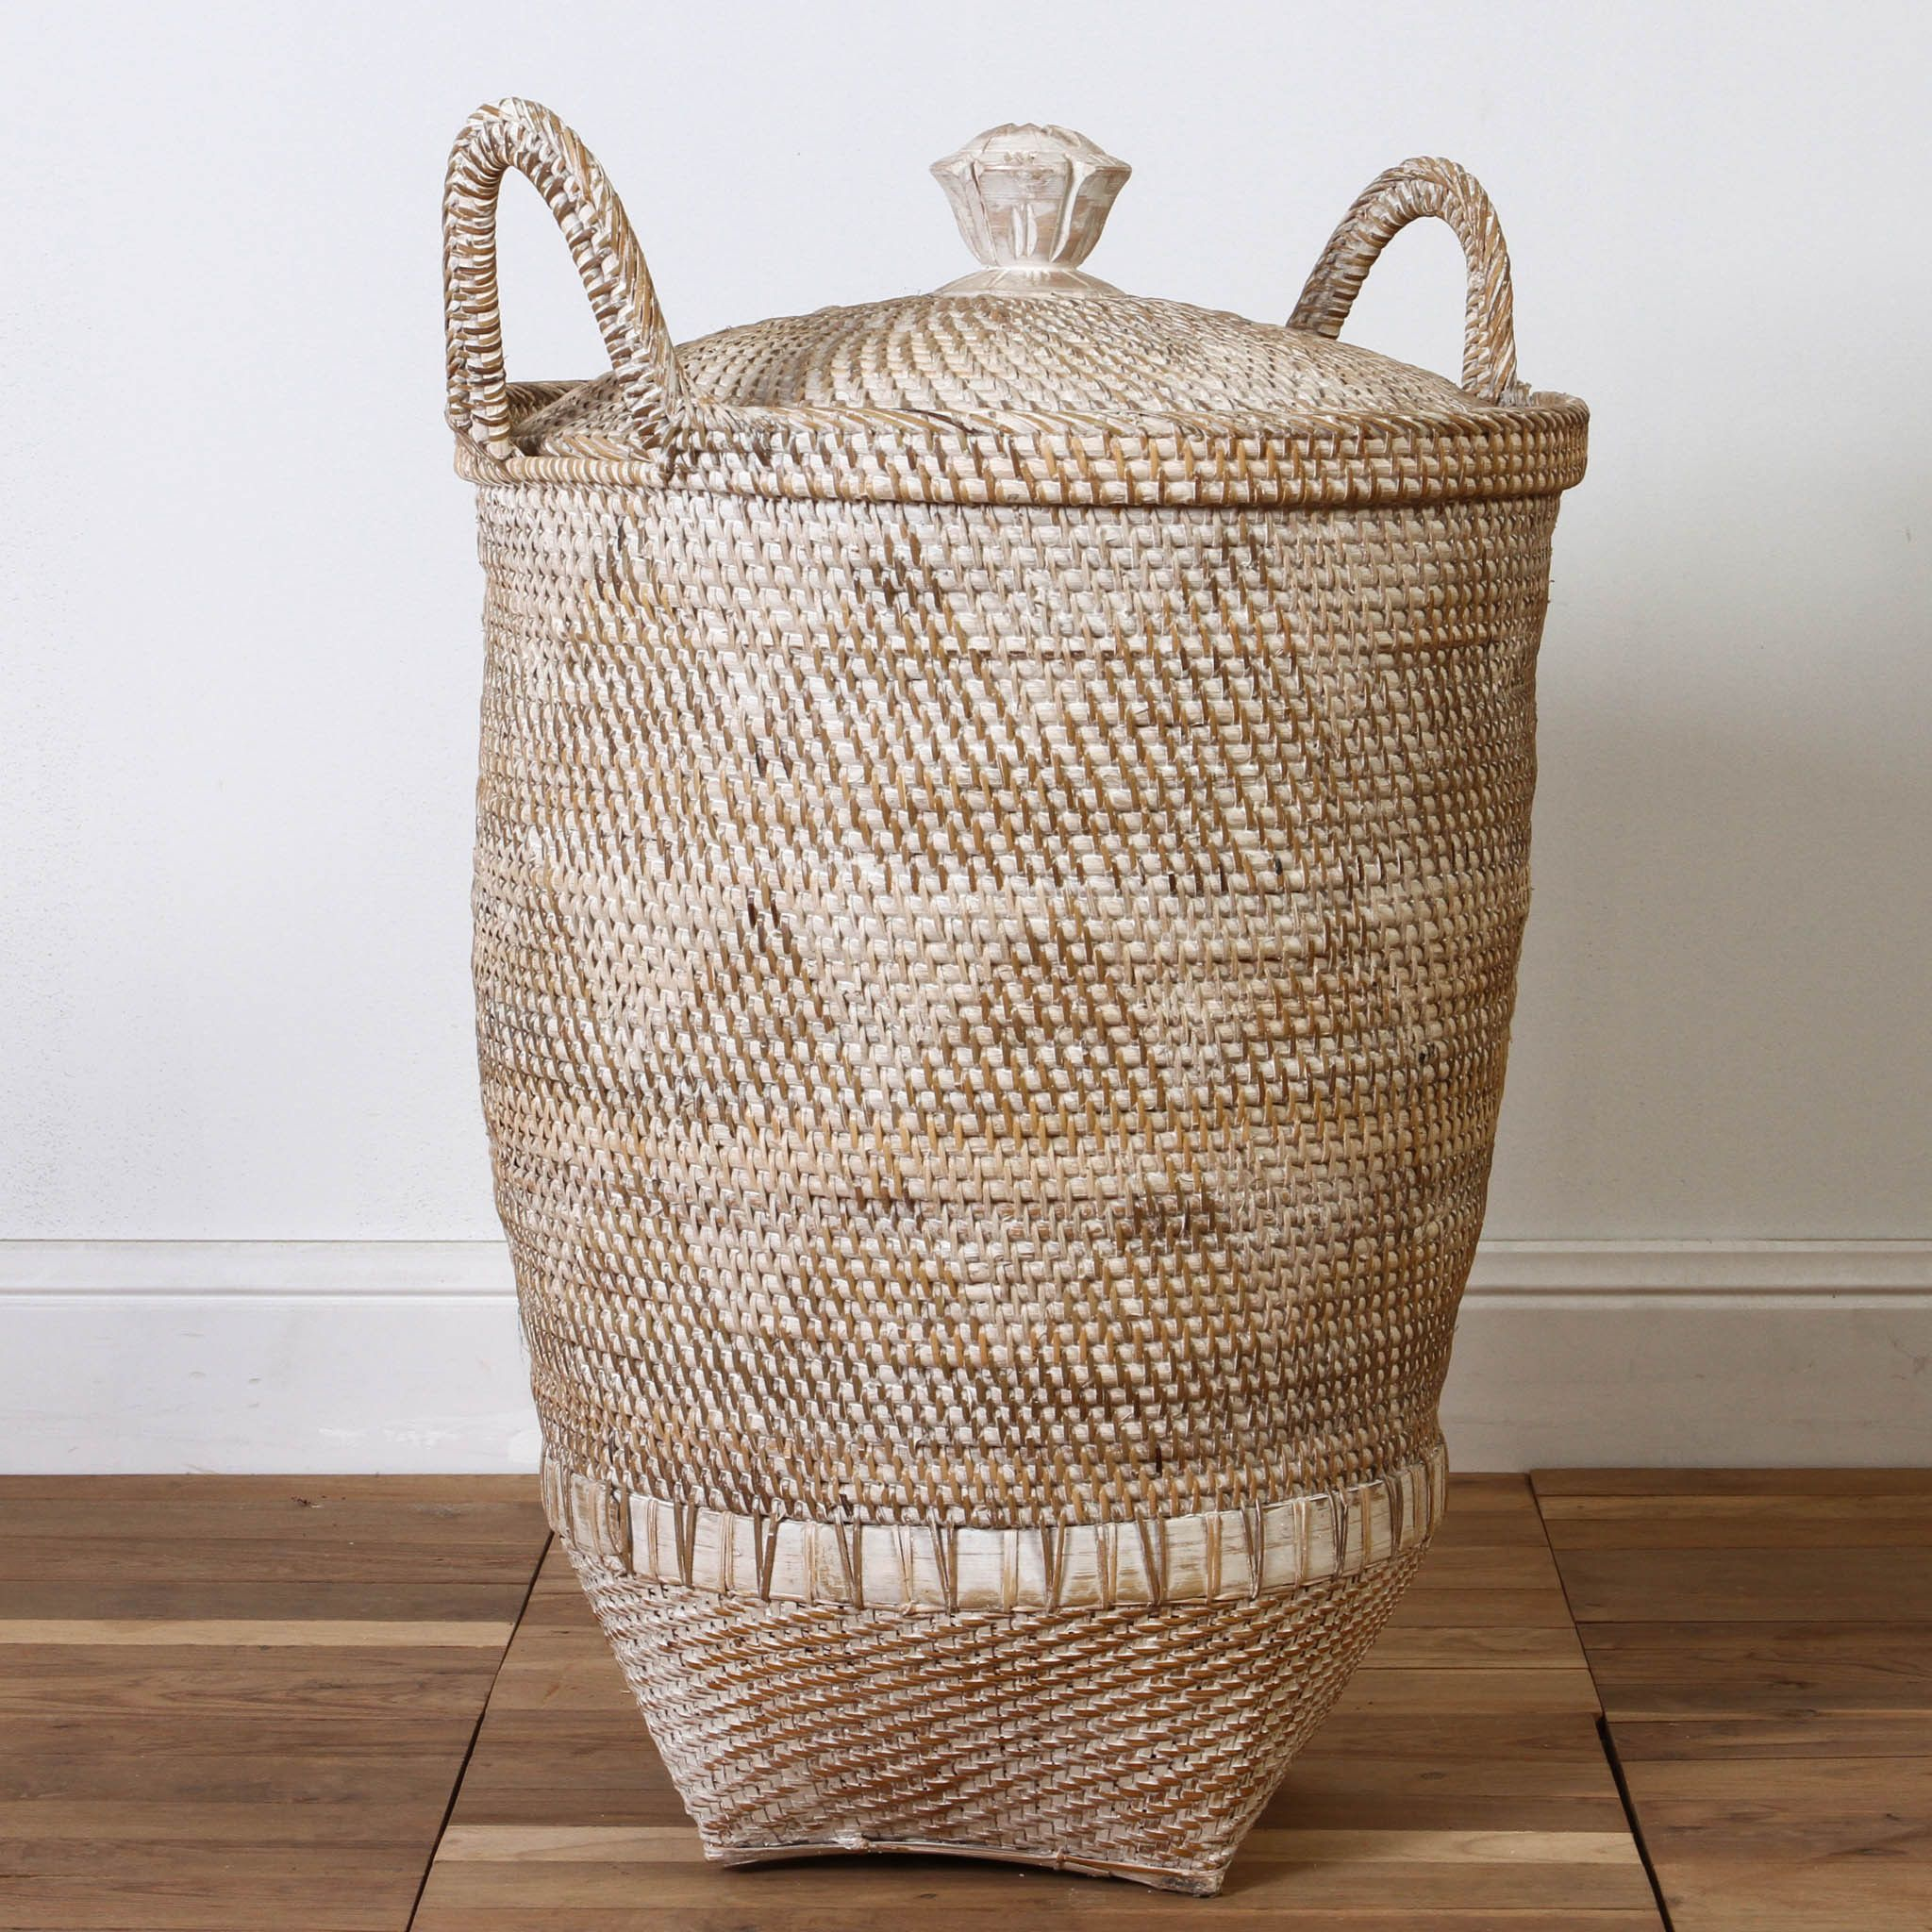 Decorative Laundry Hamper Zulu Laundry Basket  J'aime  Pinterest  Zulu Laundry And Rattan